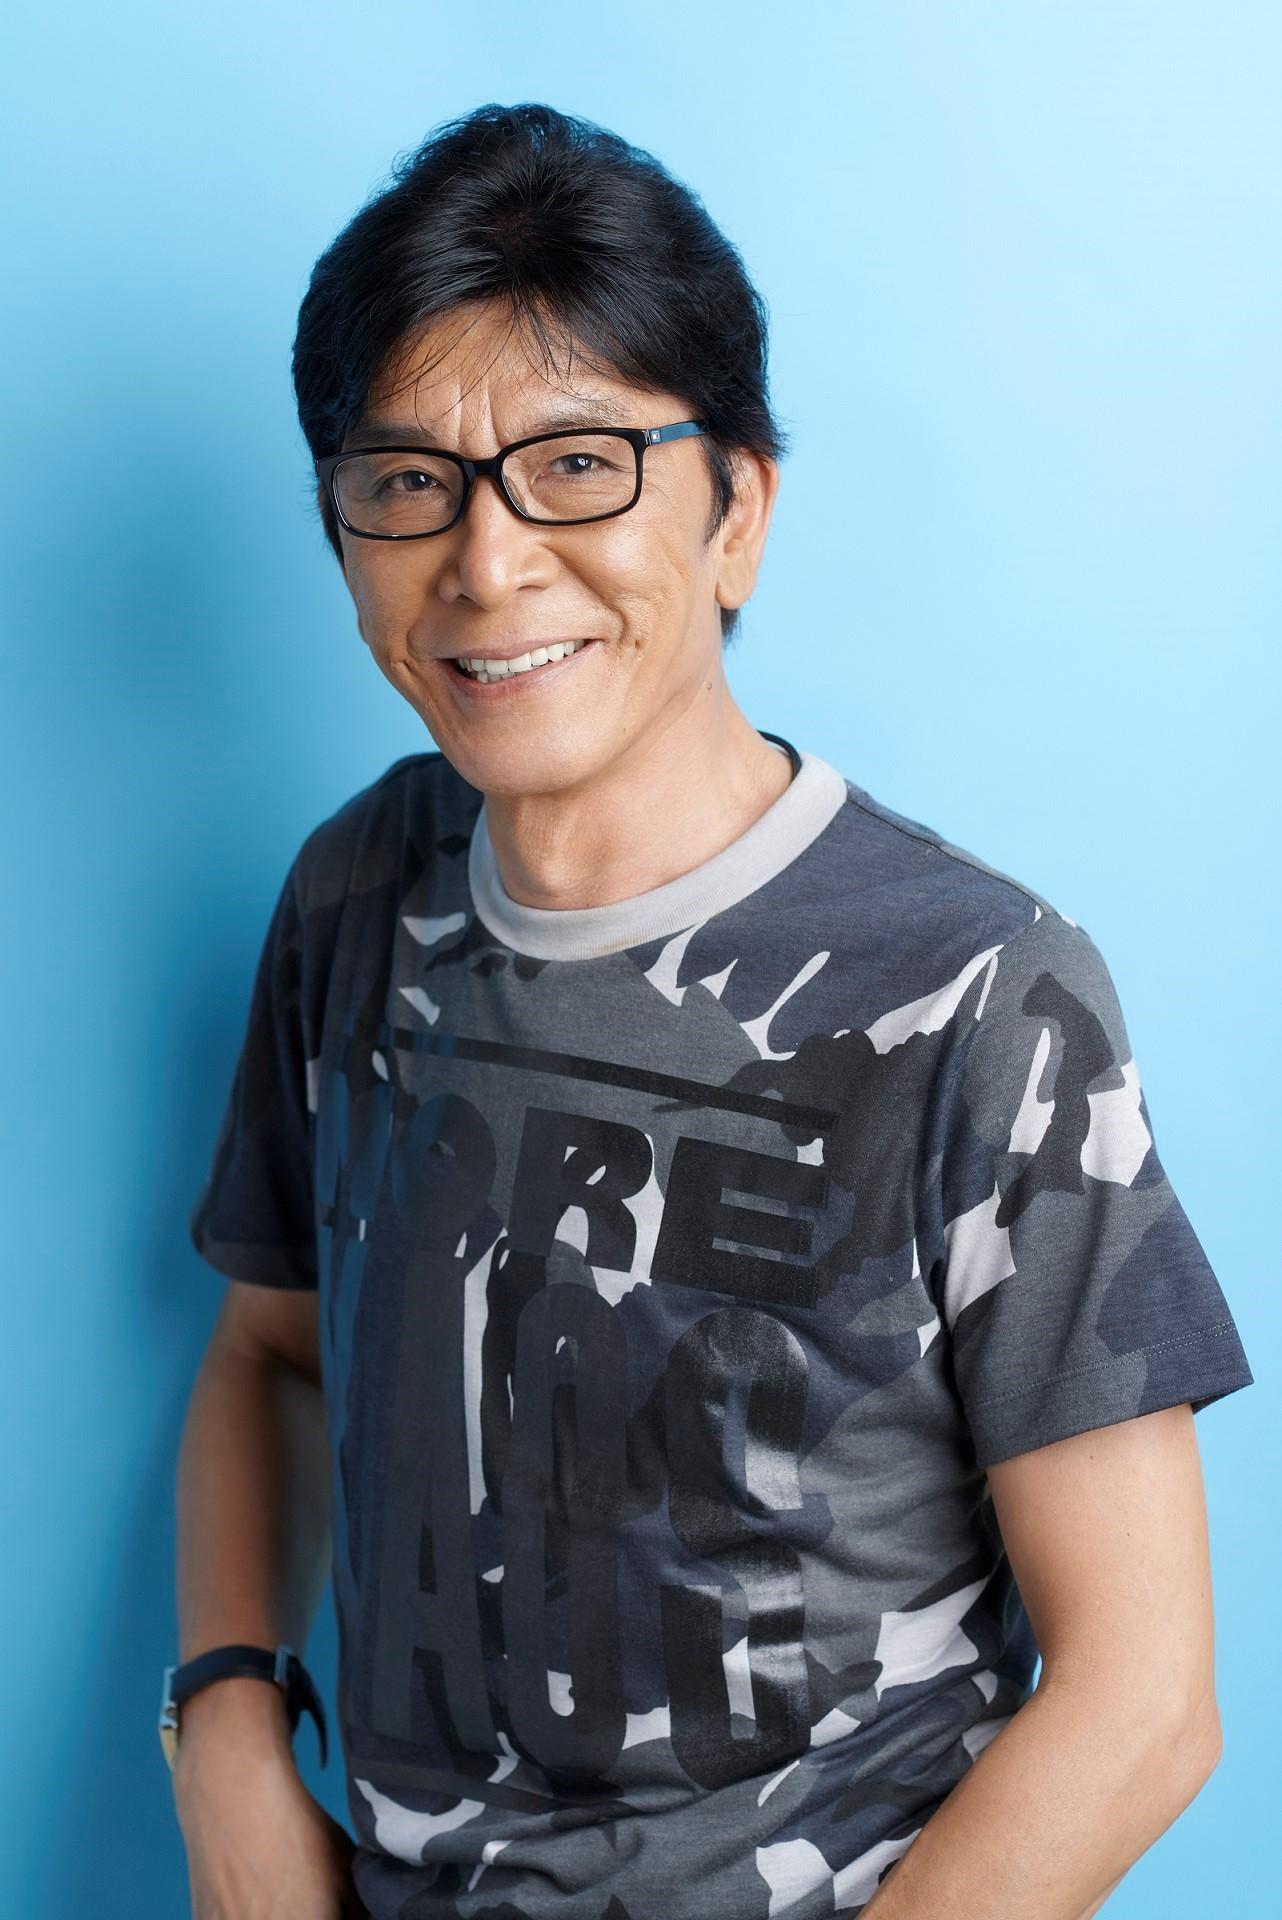 File:Jōji Nakata.jpg